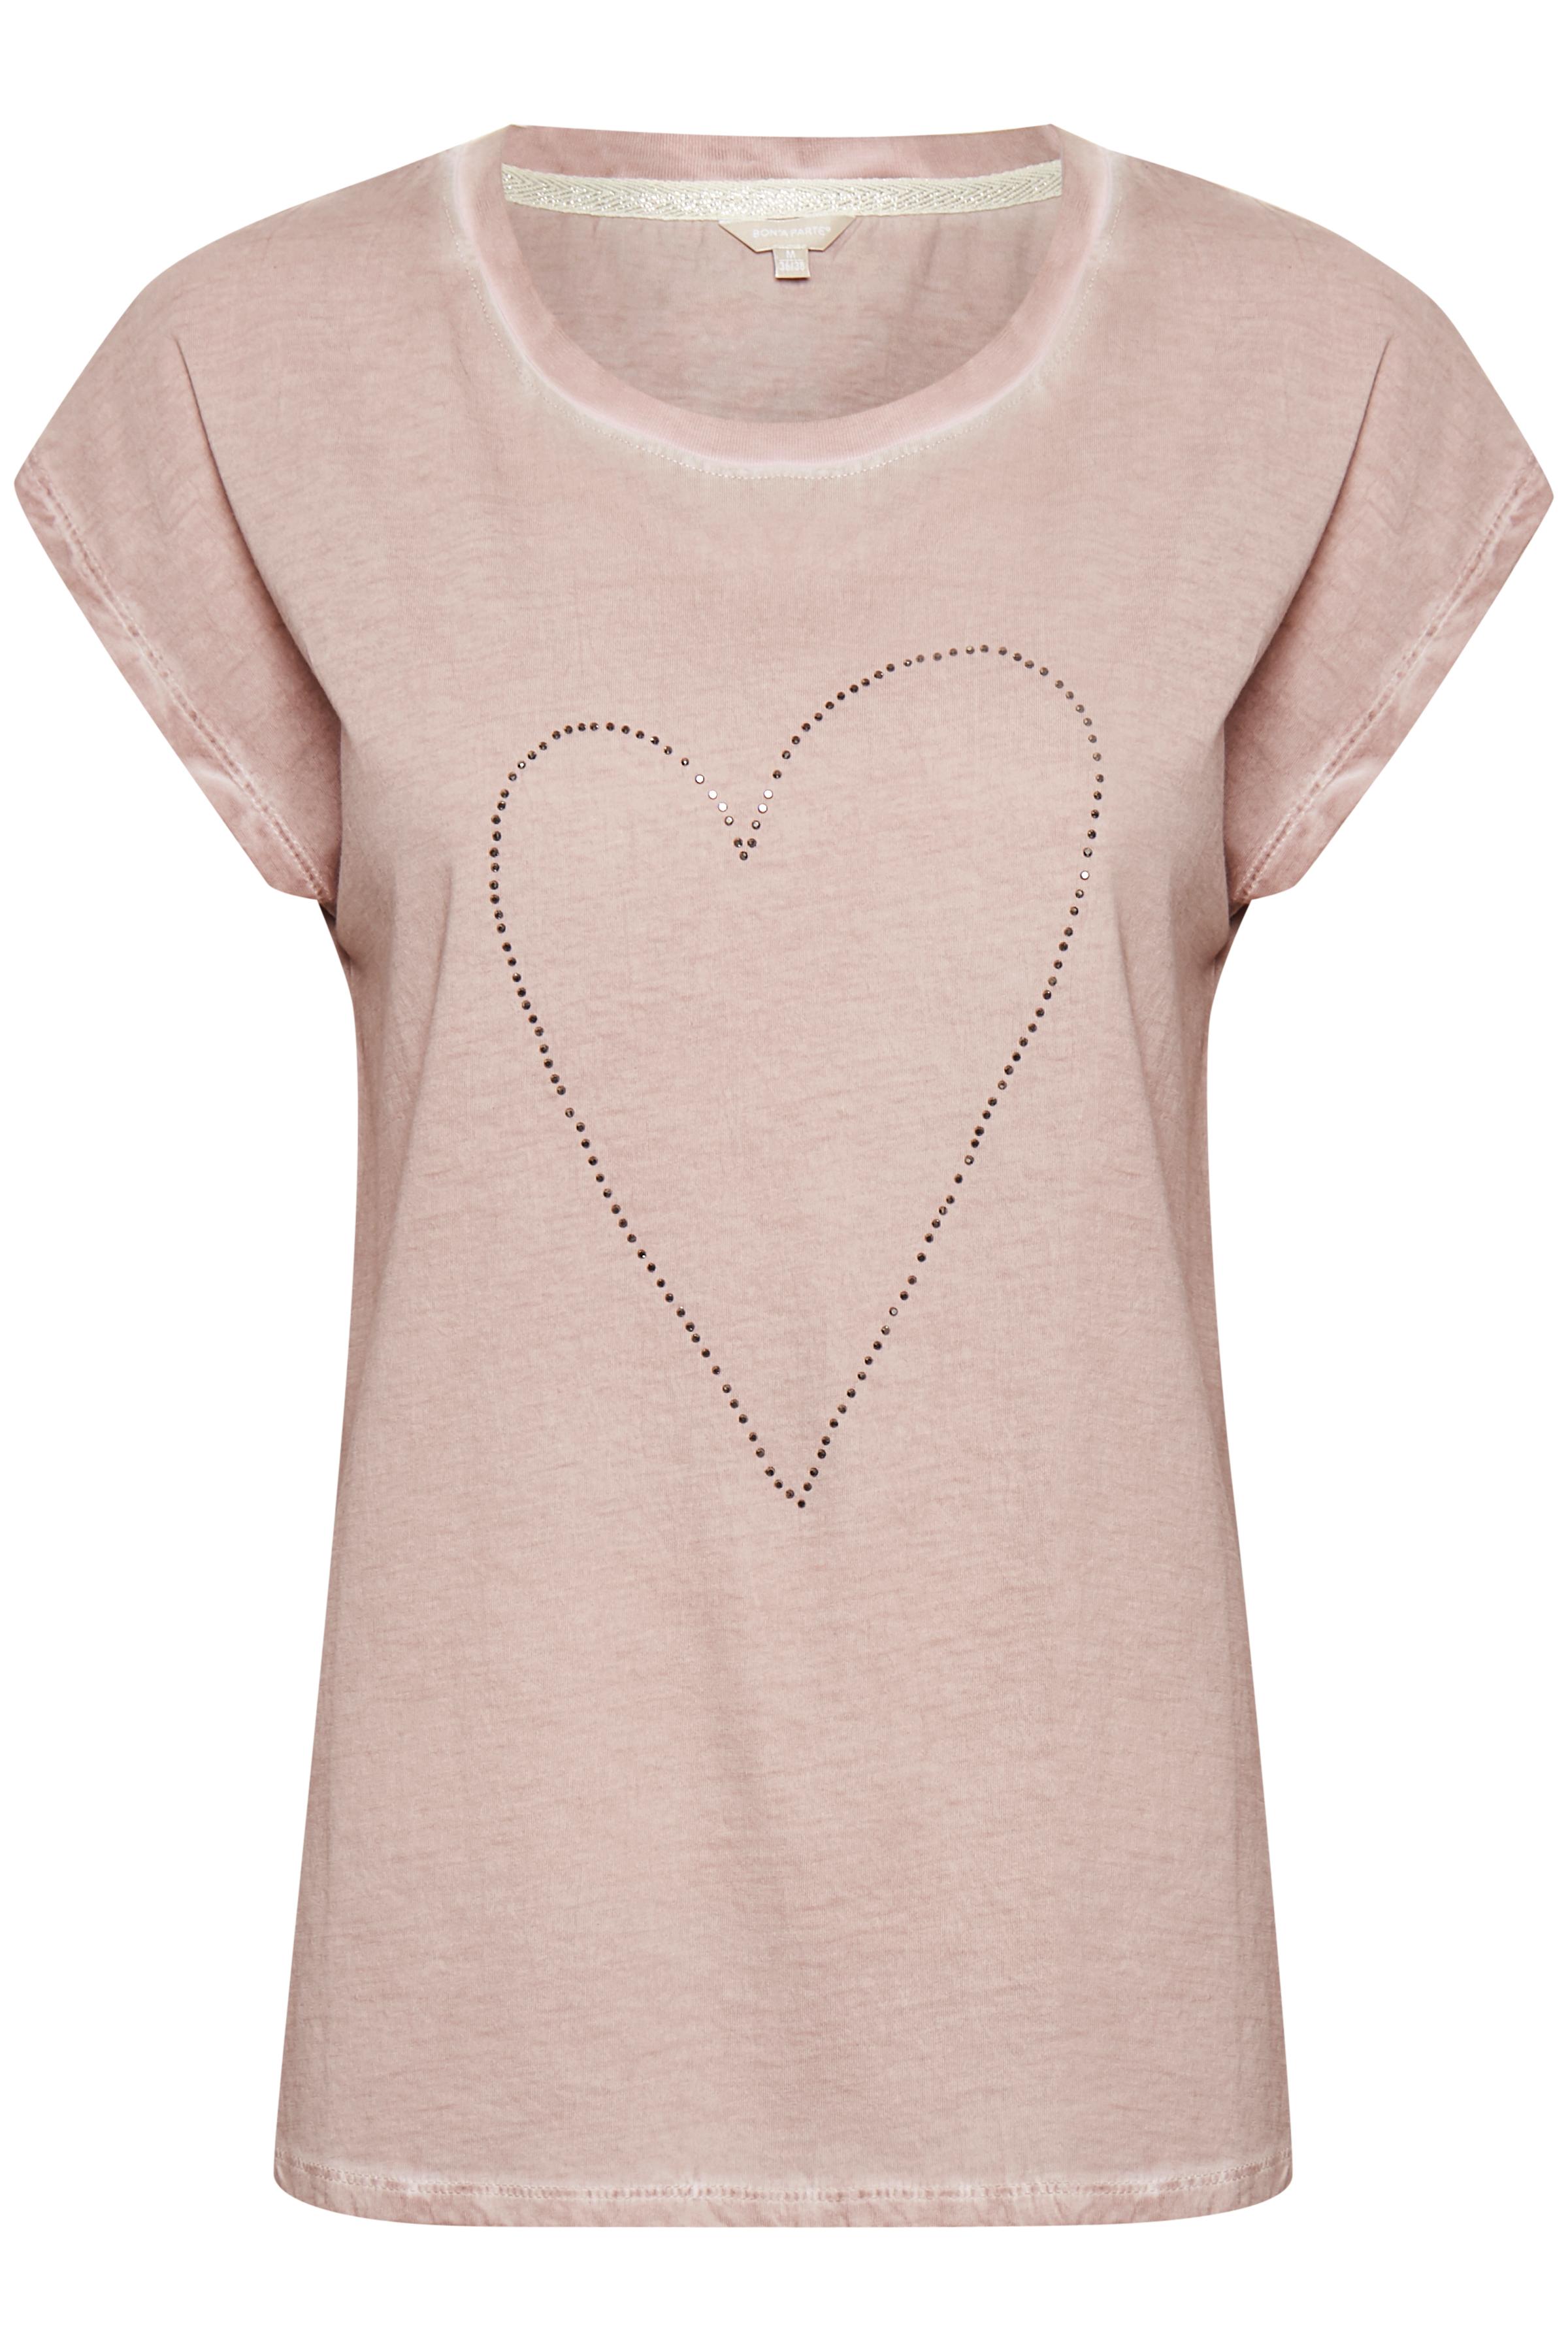 Staubrosa Kurzarm-Shirt von Bon'A Parte – Shoppen Sie Staubrosa Kurzarm-Shirt ab Gr. S-2XL hier